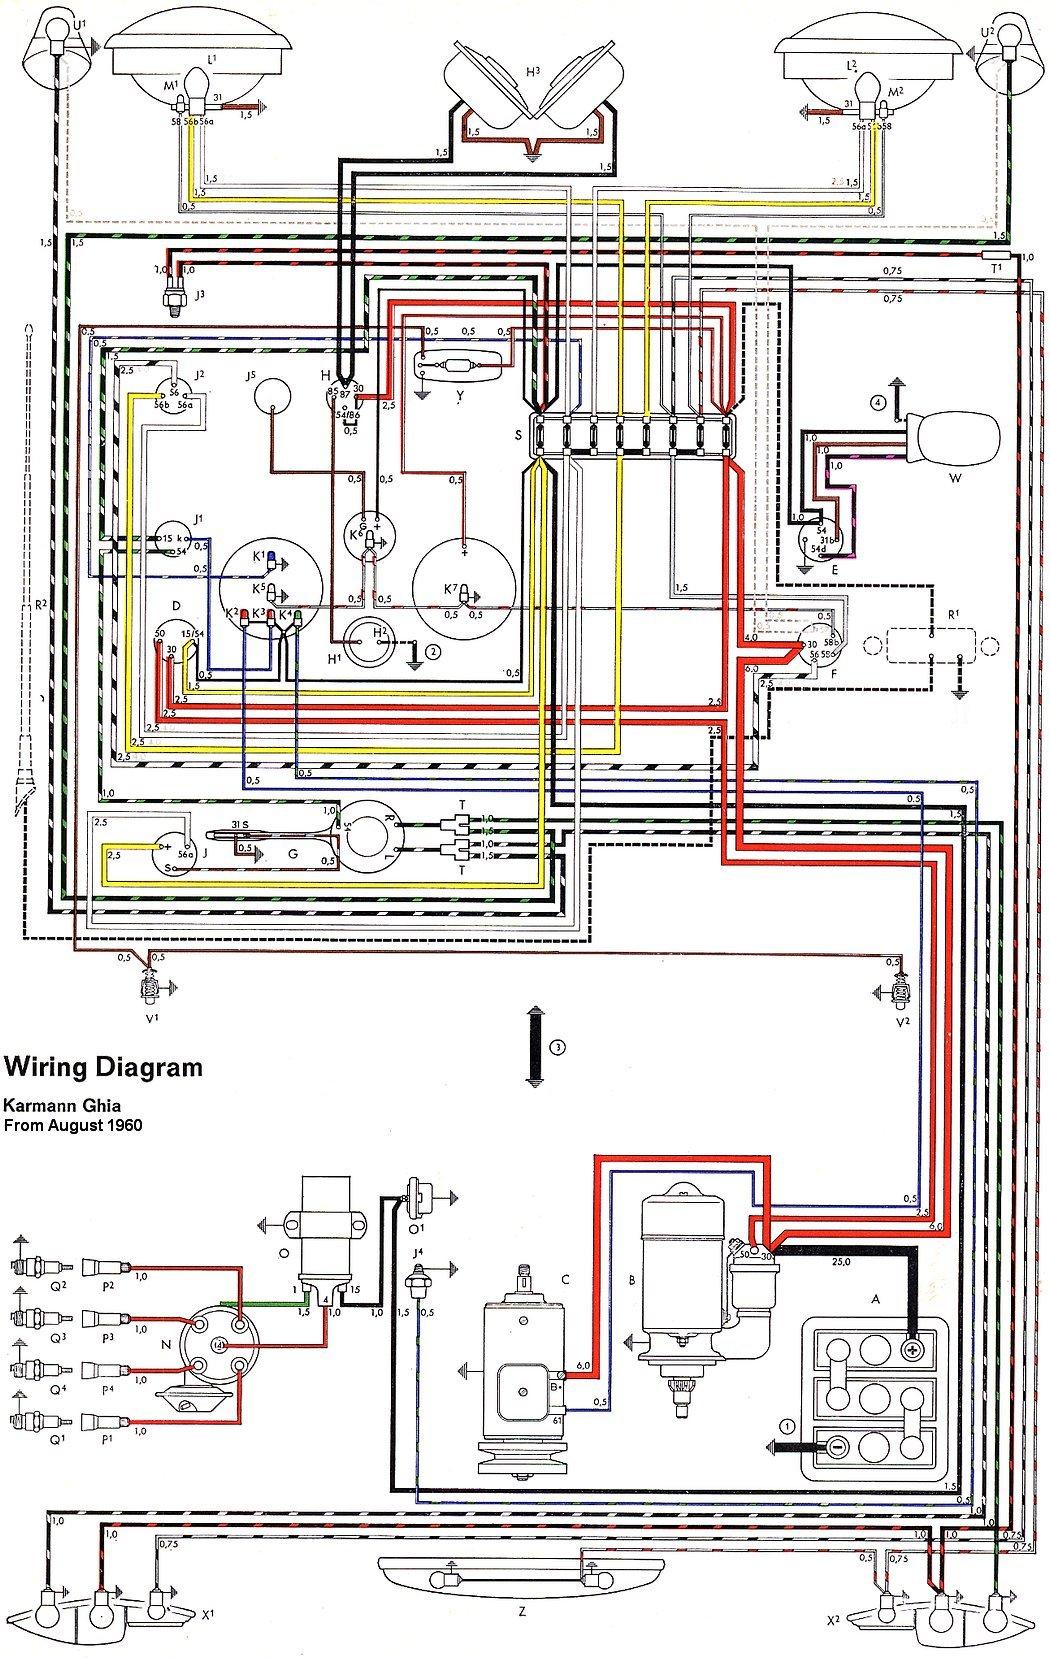 1958 Karmann Ghia Wiring Diagram | Wiring Schematic Diagram on austin healey wiring diagram, volvo wiring diagram, acura wiring diagram, jeep wiring diagram, eurovan wiring diagram, mitsubishi wiring diagram, mgb wiring diagram, dodge wiring diagram, type 3 wiring diagram, chevrolet wiring diagram, vw wiring diagram, mustang wiring diagram, van wiring diagram, lincoln wiring diagram, bug wiring diagram, toyota wiring diagram, type 181 wiring diagram, chrysler wiring diagram, corvette wiring diagram, audi wiring diagram,